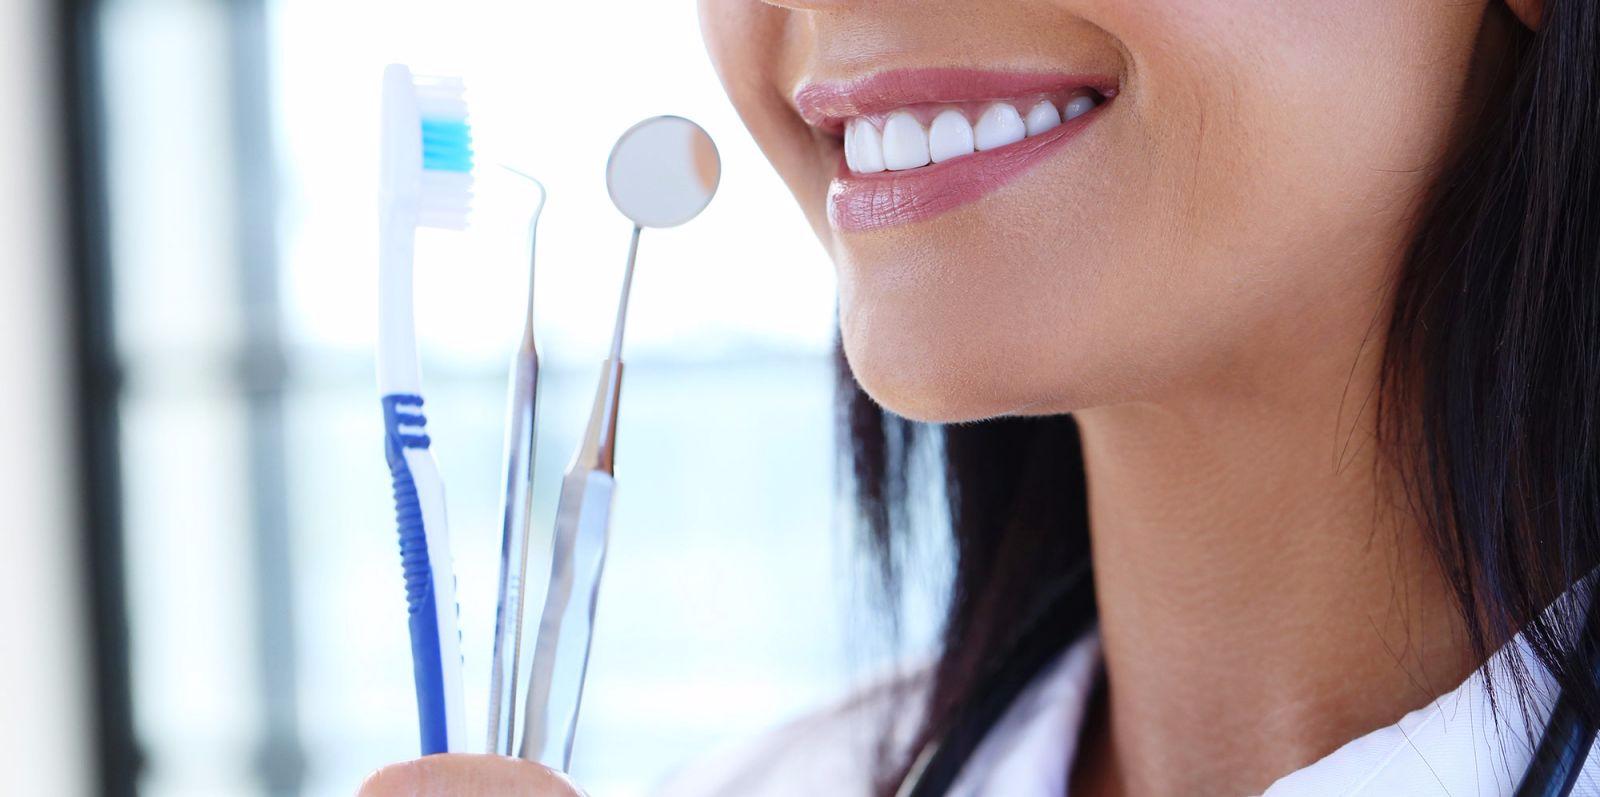 visite de controle dentiste